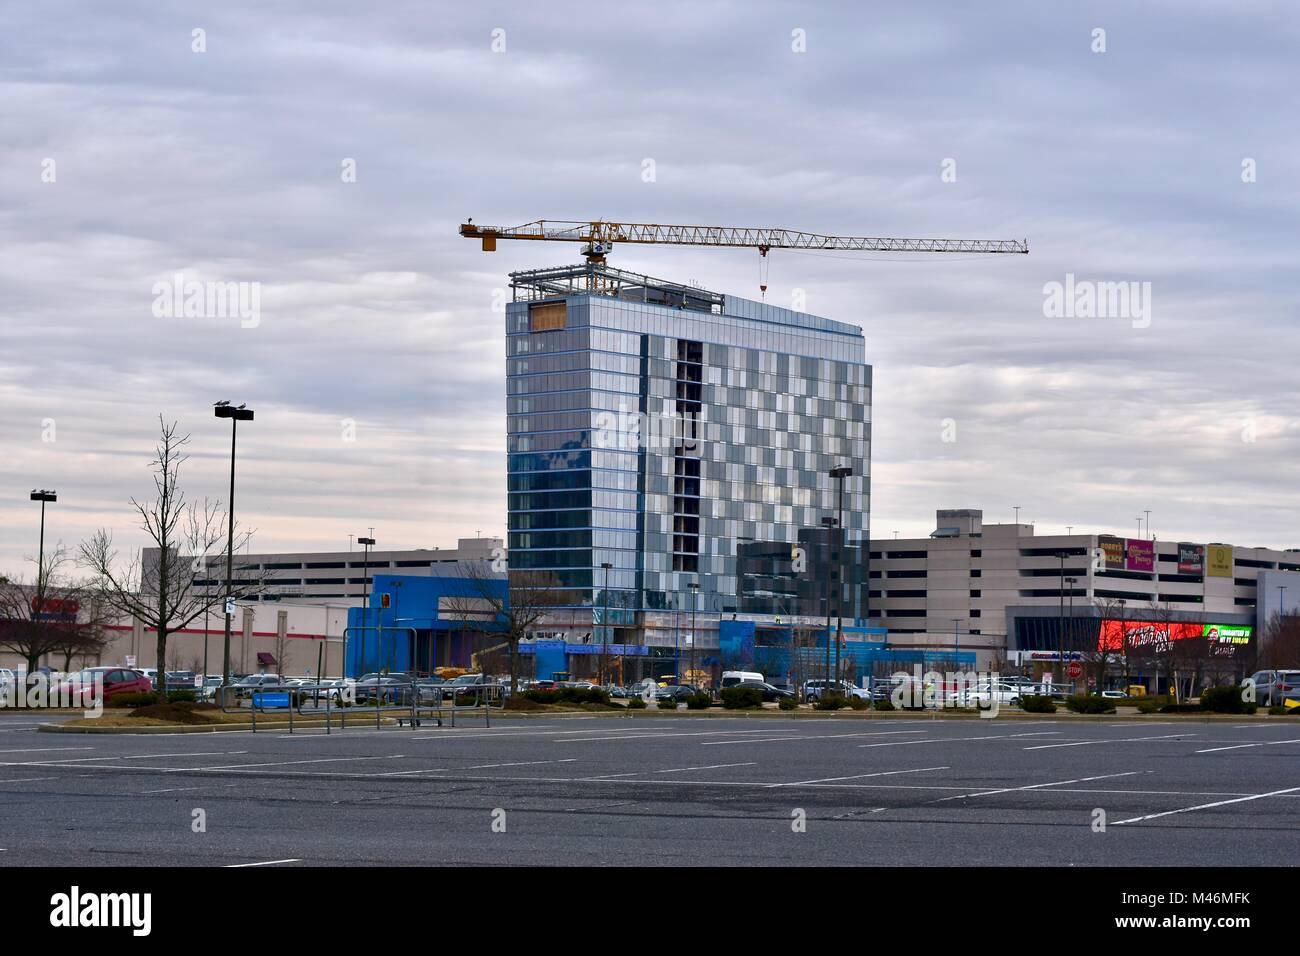 Maryland Live Casino Hotel Hanover Md Usa Stock Photo Alamy